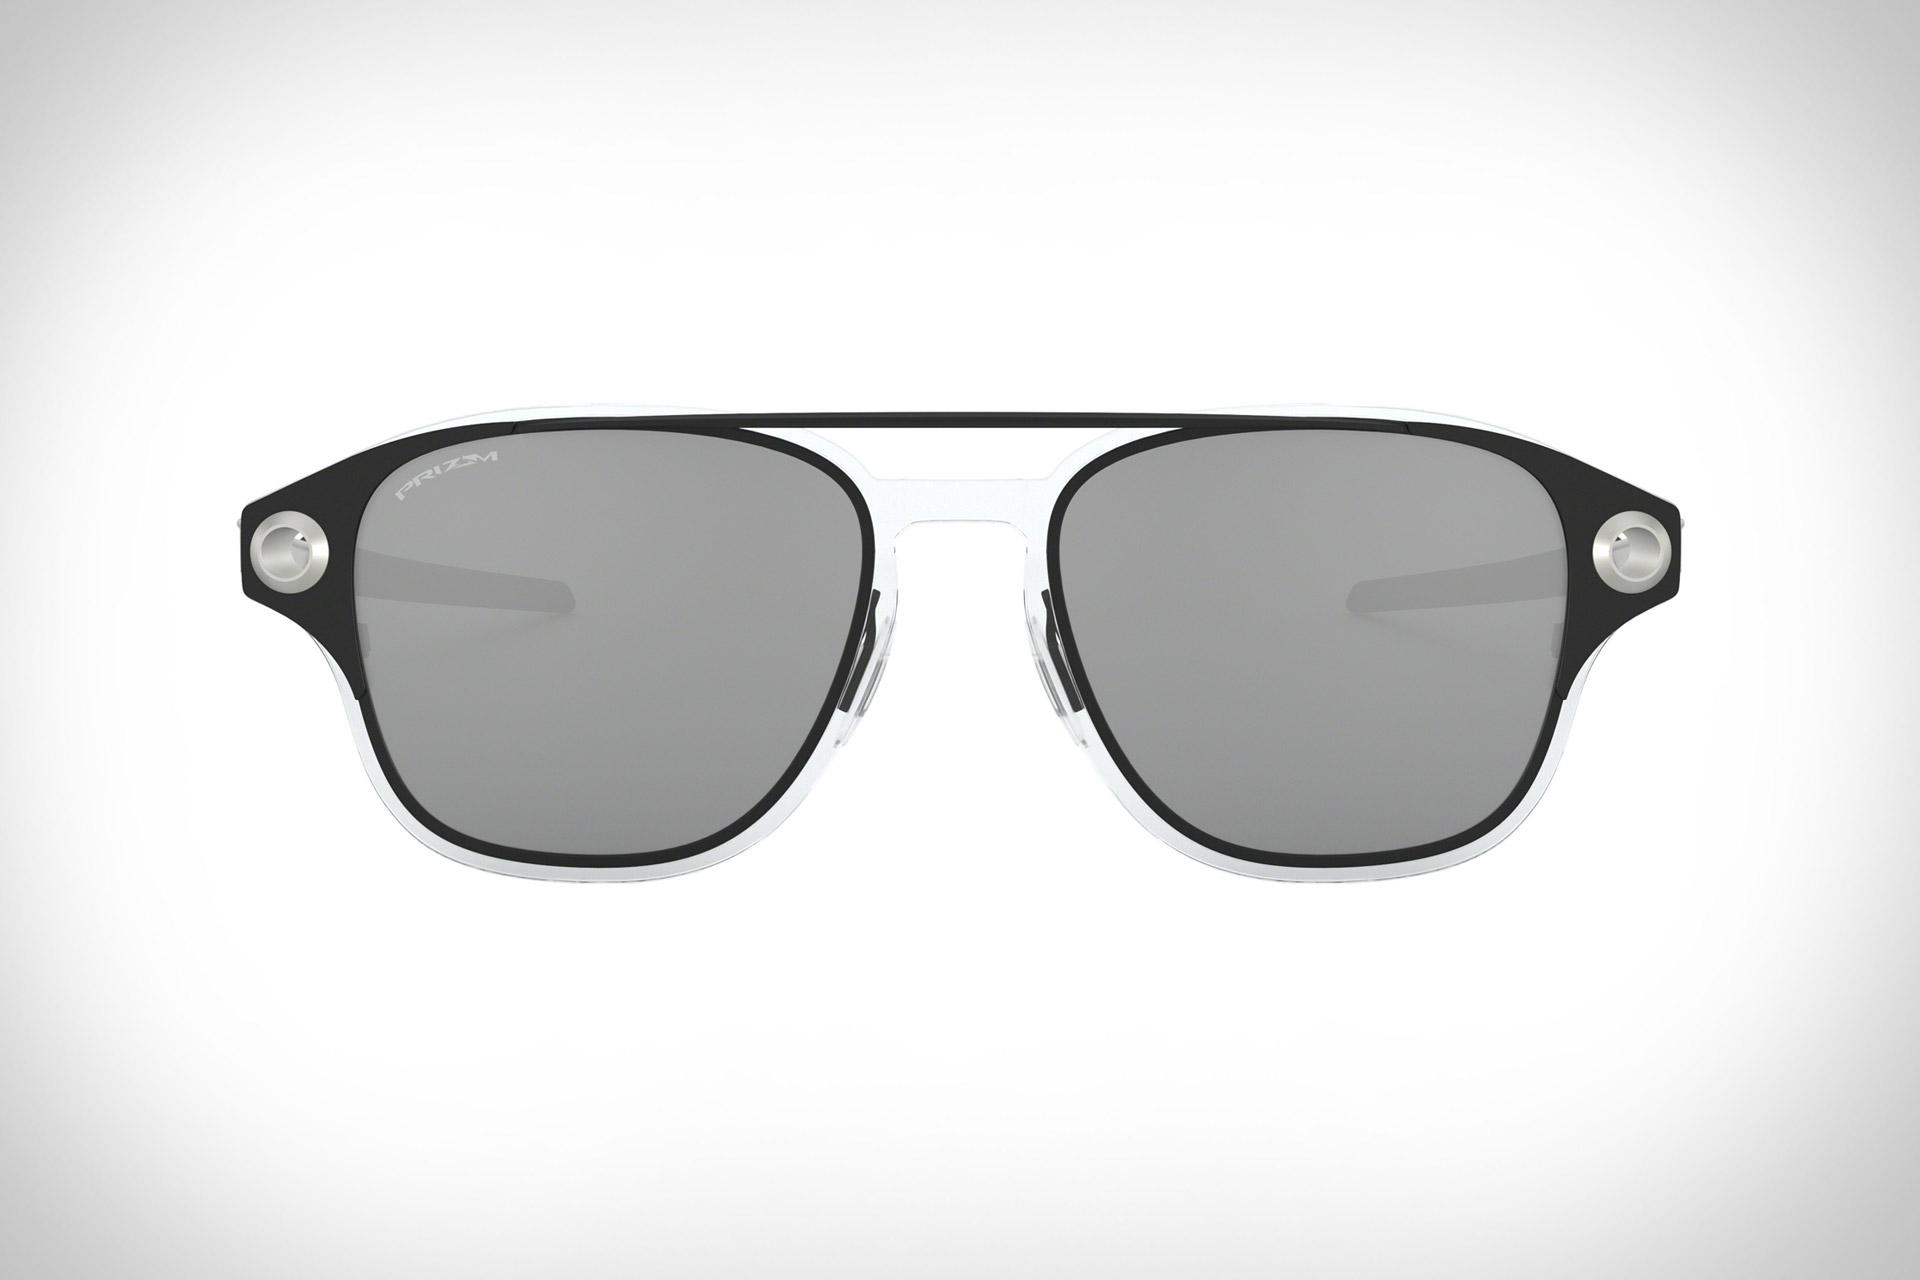 Oakley Ahyris Collection Eyewear